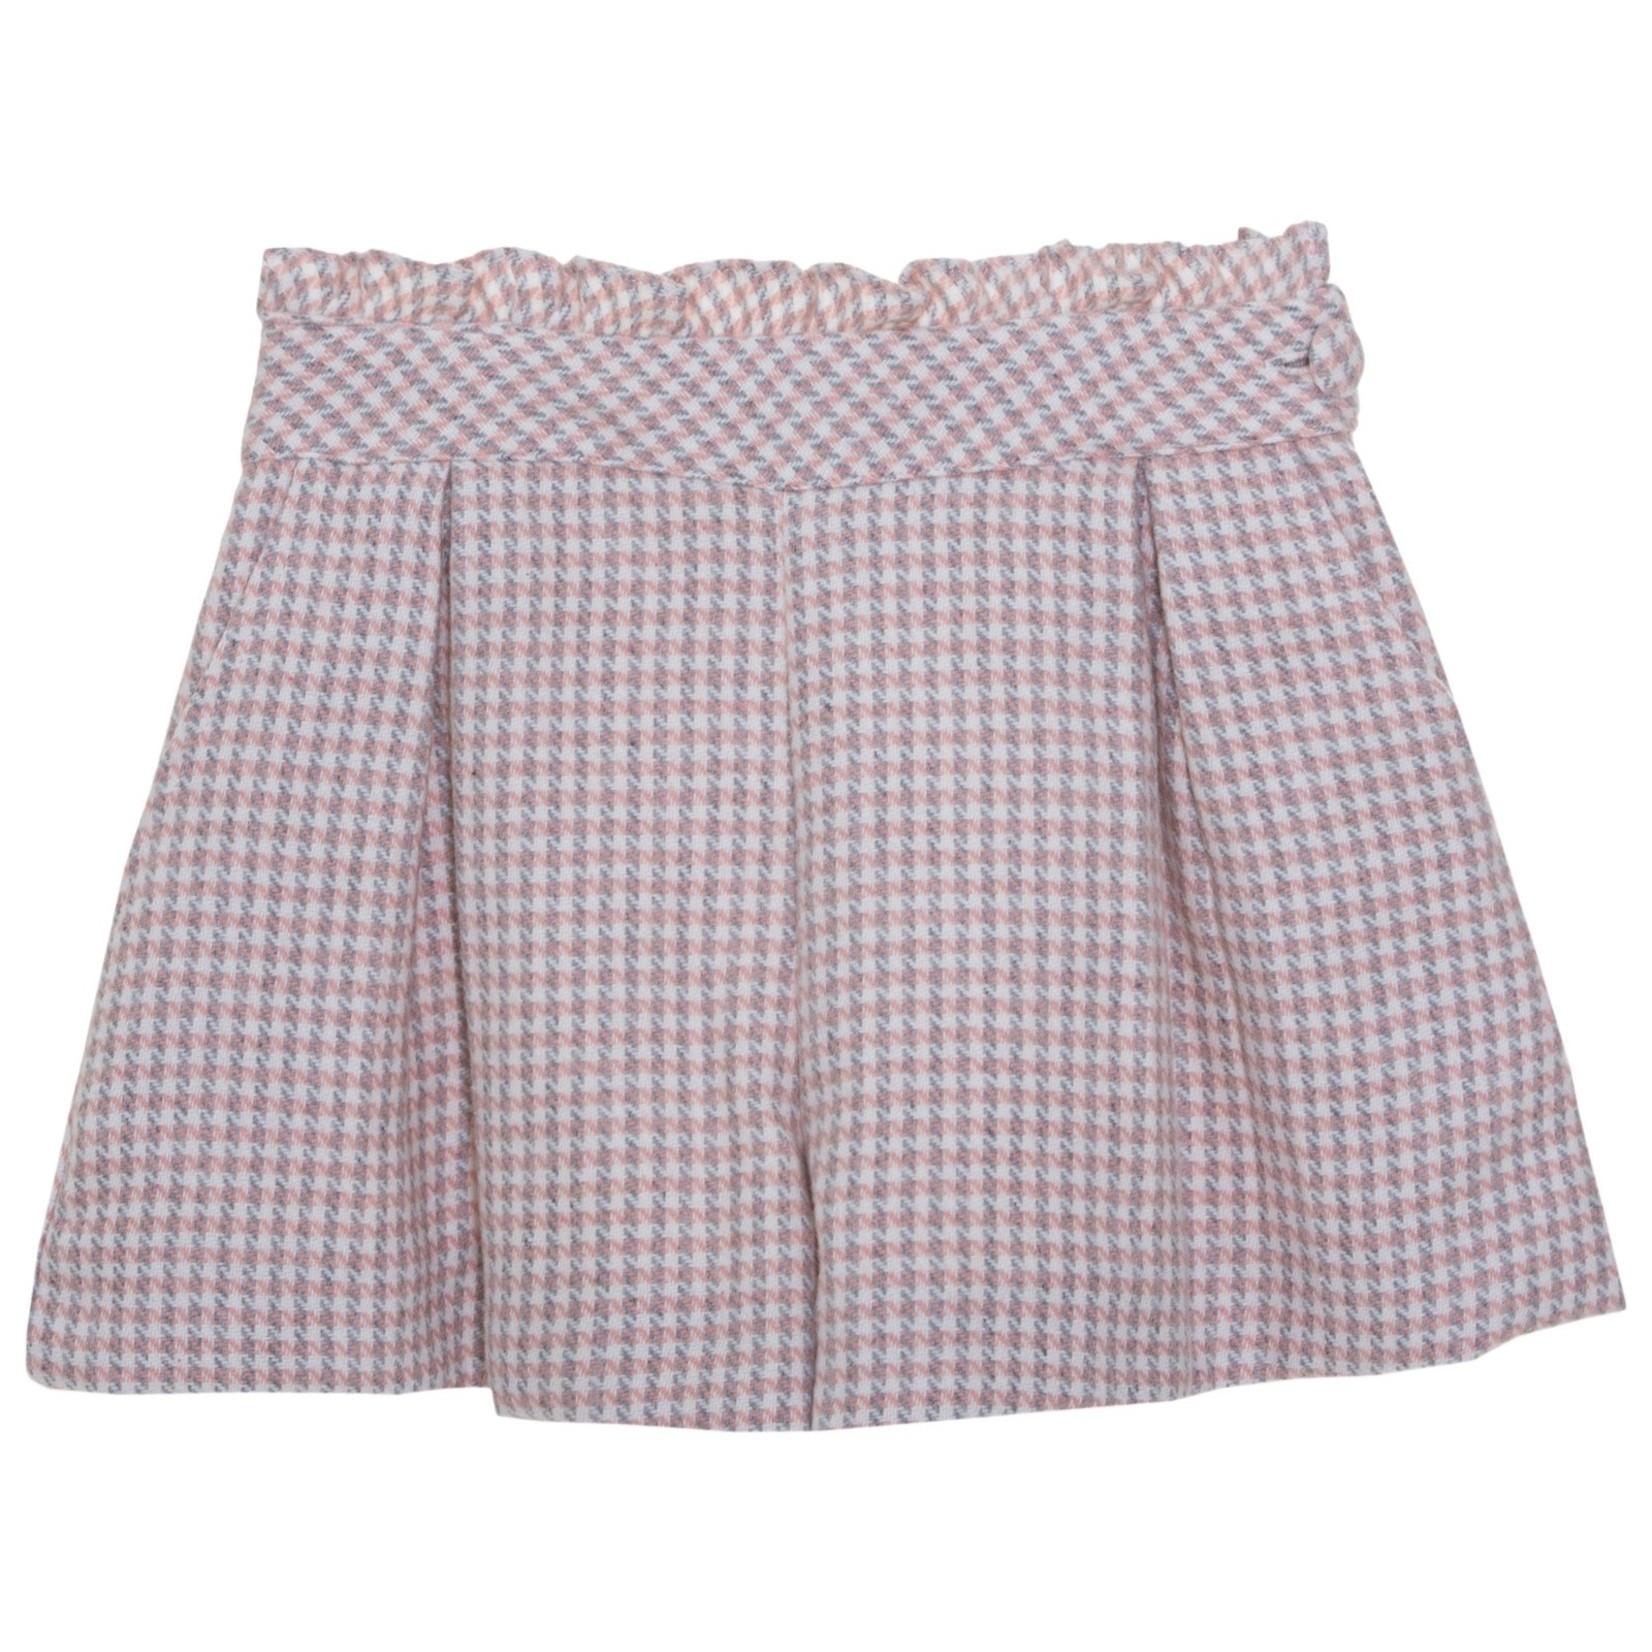 Patachou Short Pink Tartan - Patachou